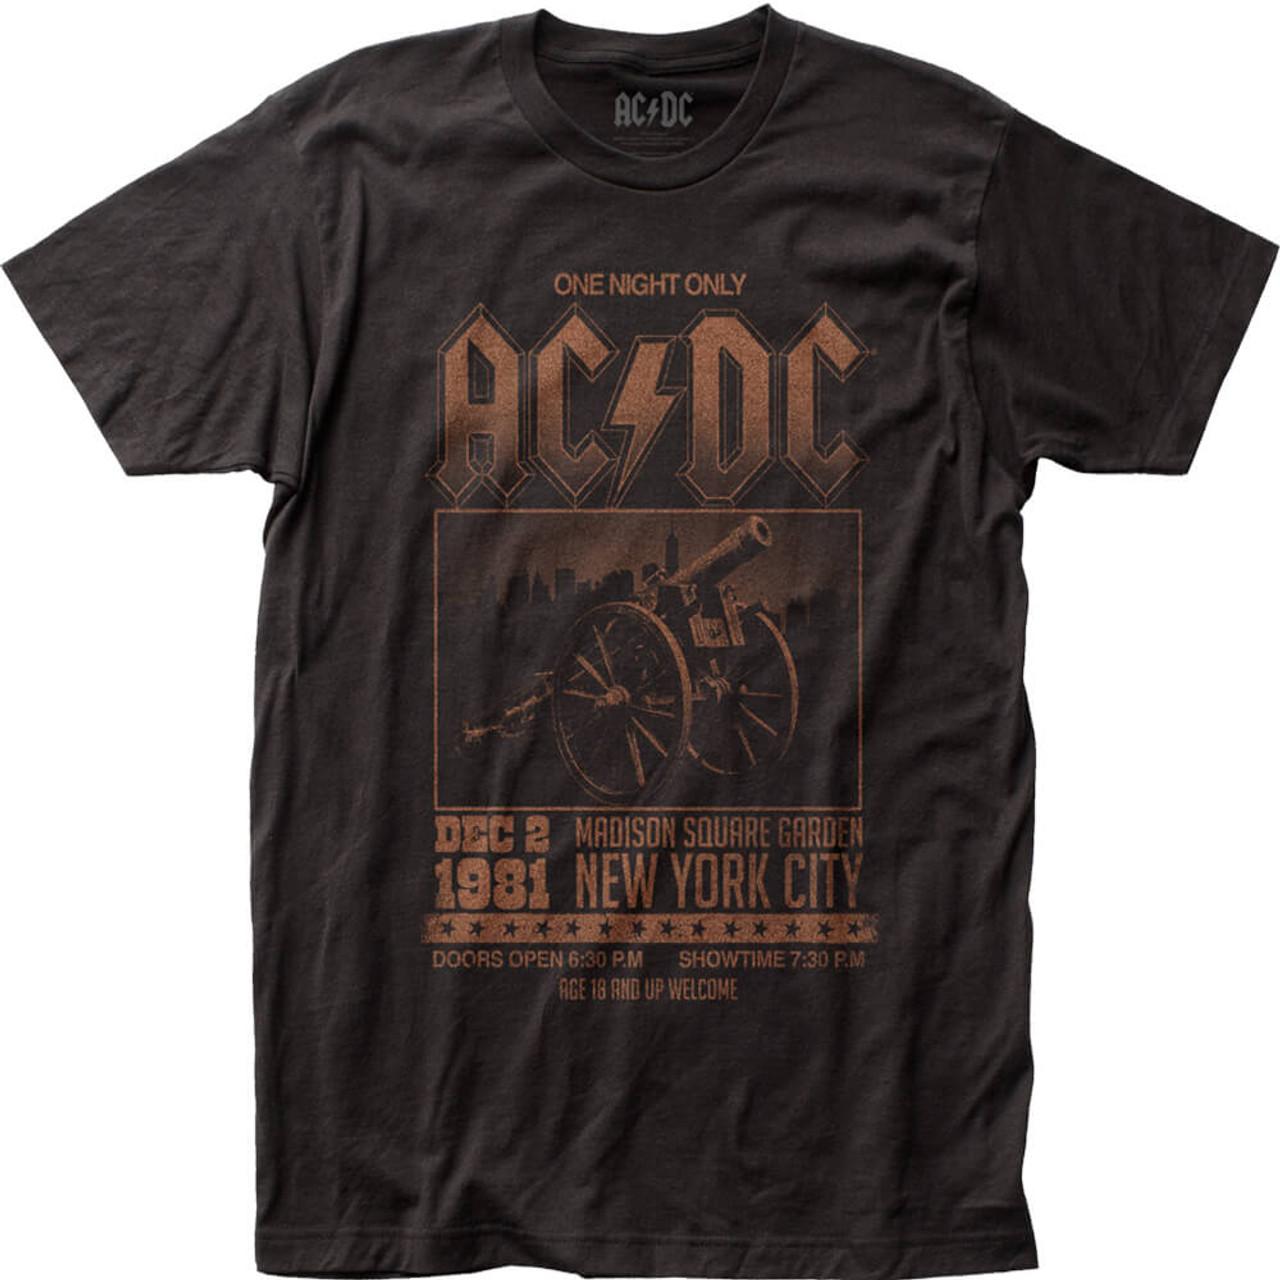 AC/DC Madison Square Garden December 1981 Concert T-shirt ...